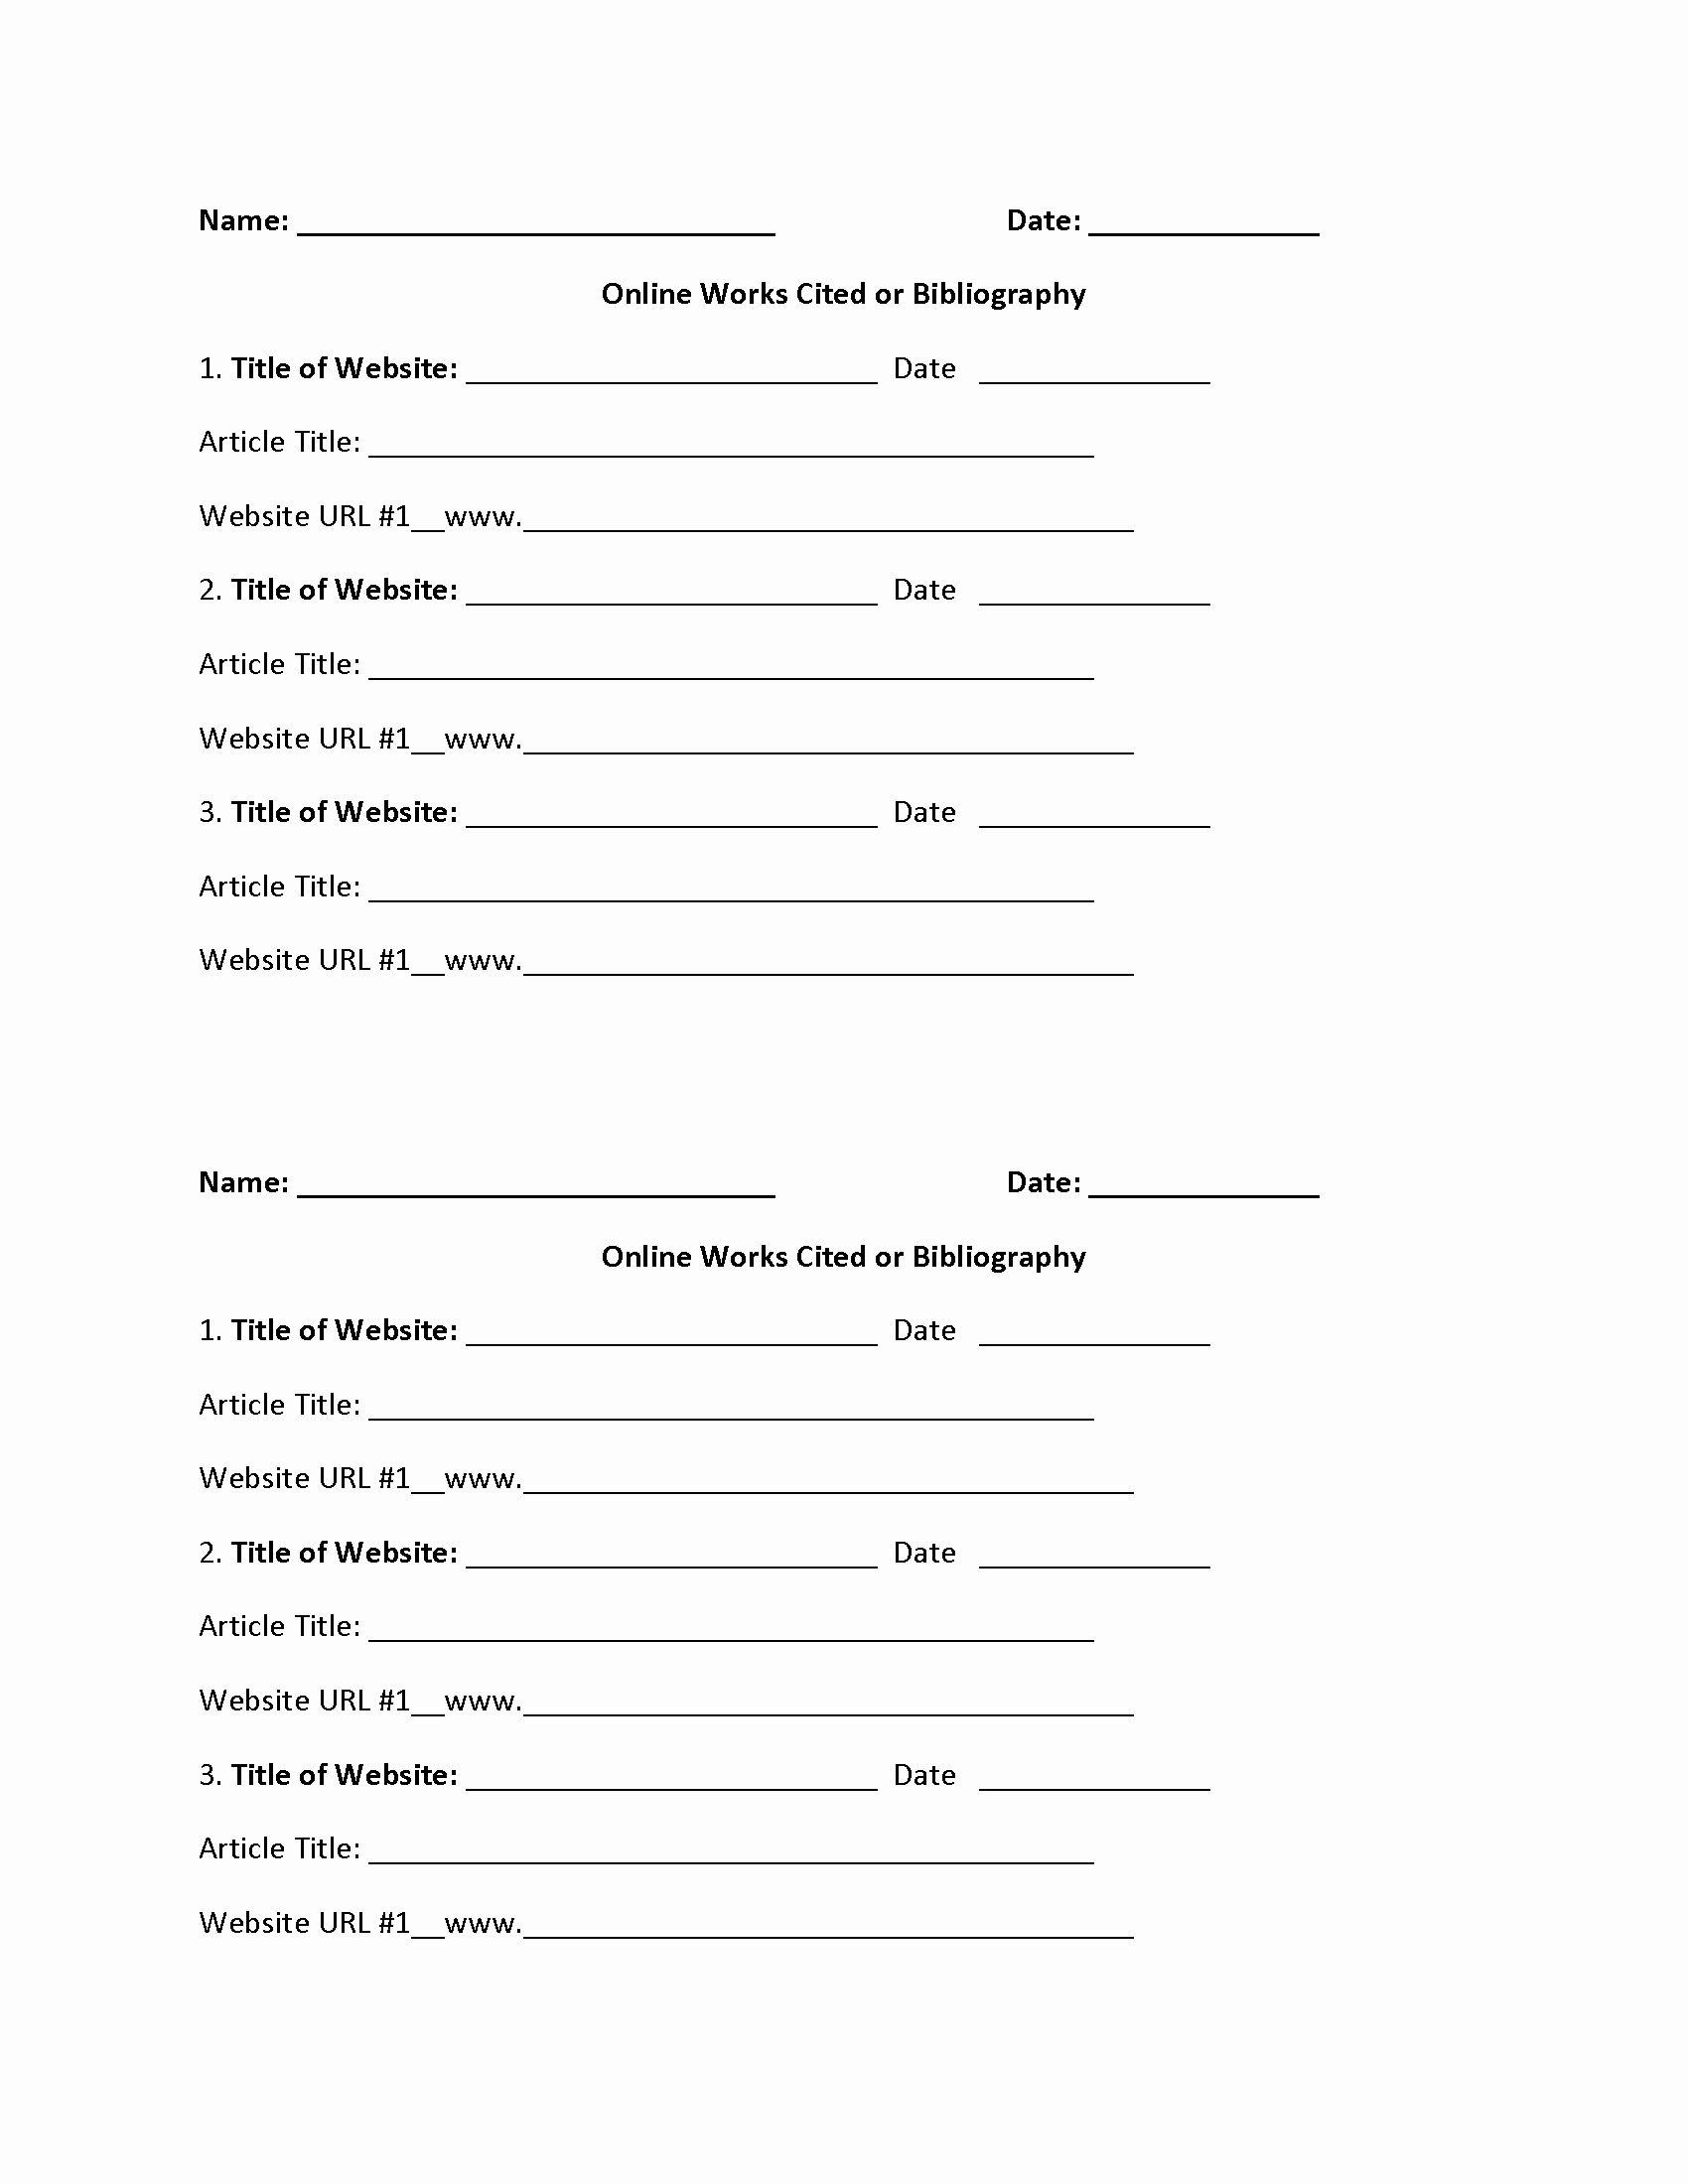 Mla Citation Practice Worksheet Inspirational Works Cited Worksheets In 2020 Works Cited Mla Citation Practice Practices Worksheets